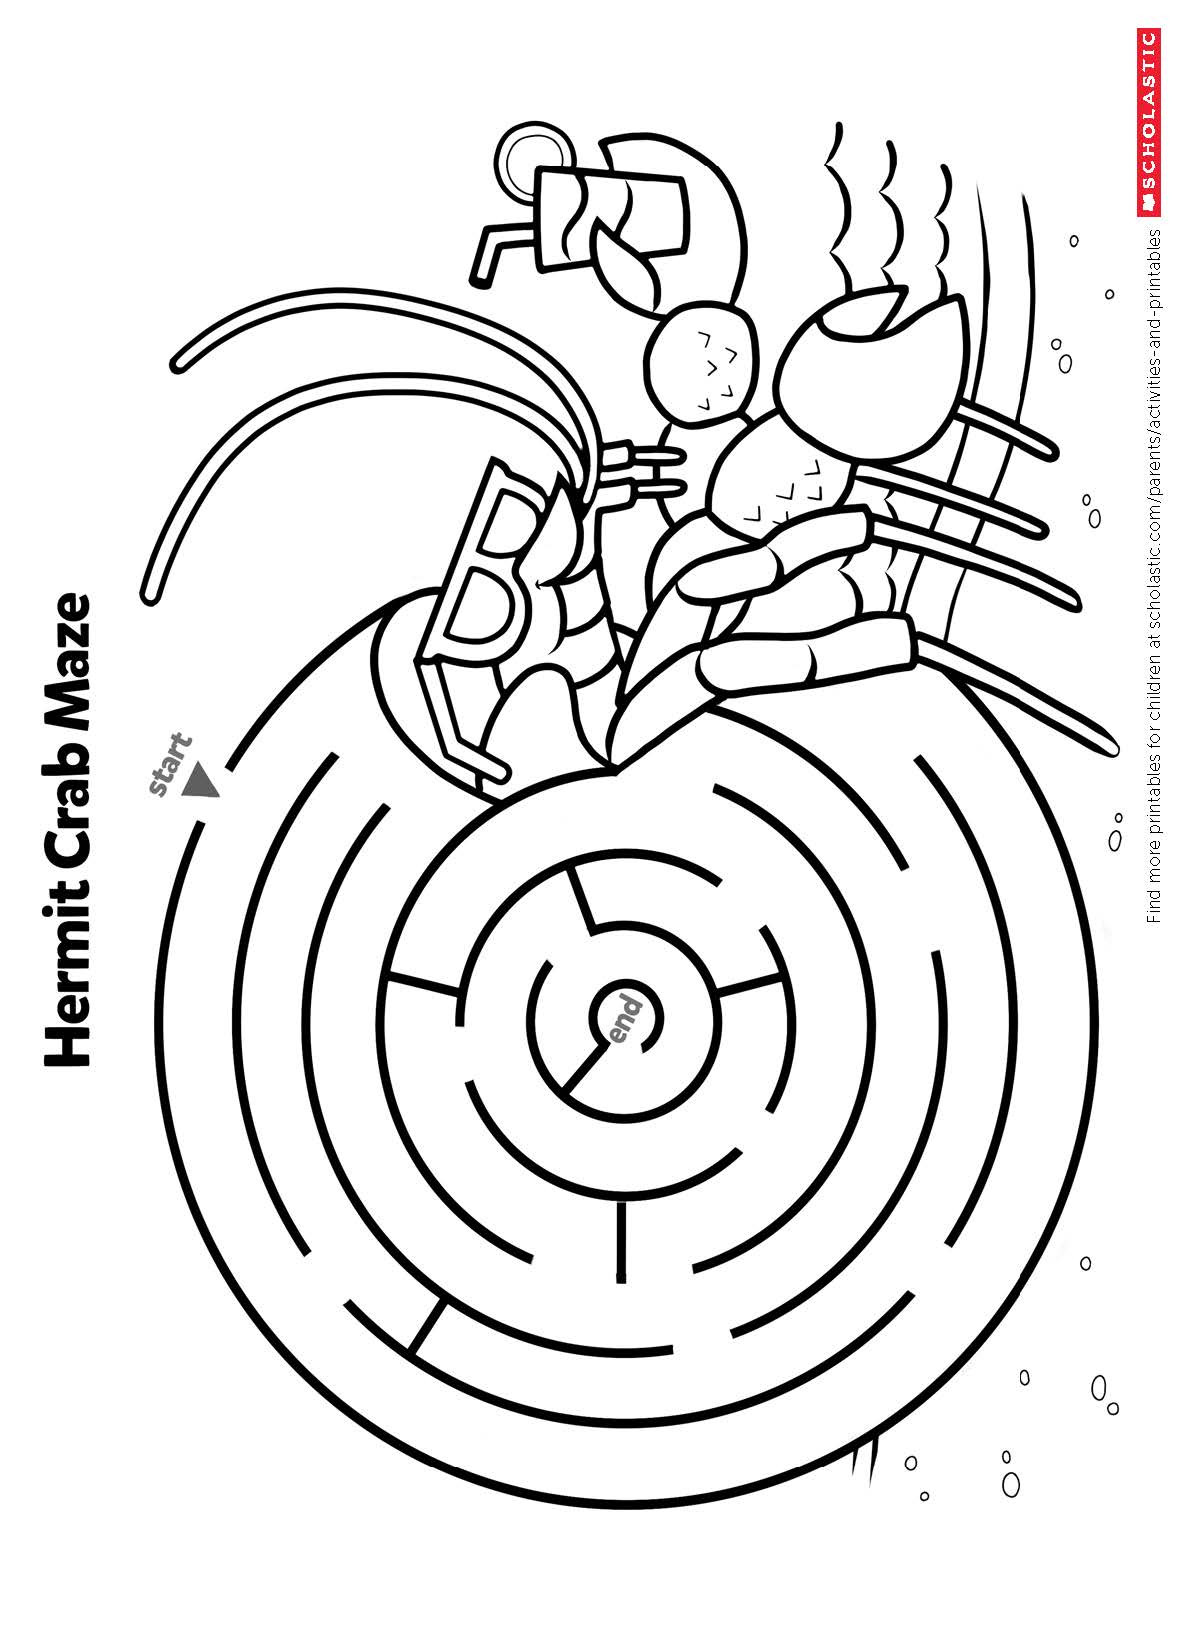 Sponges A Coloring Worksheet